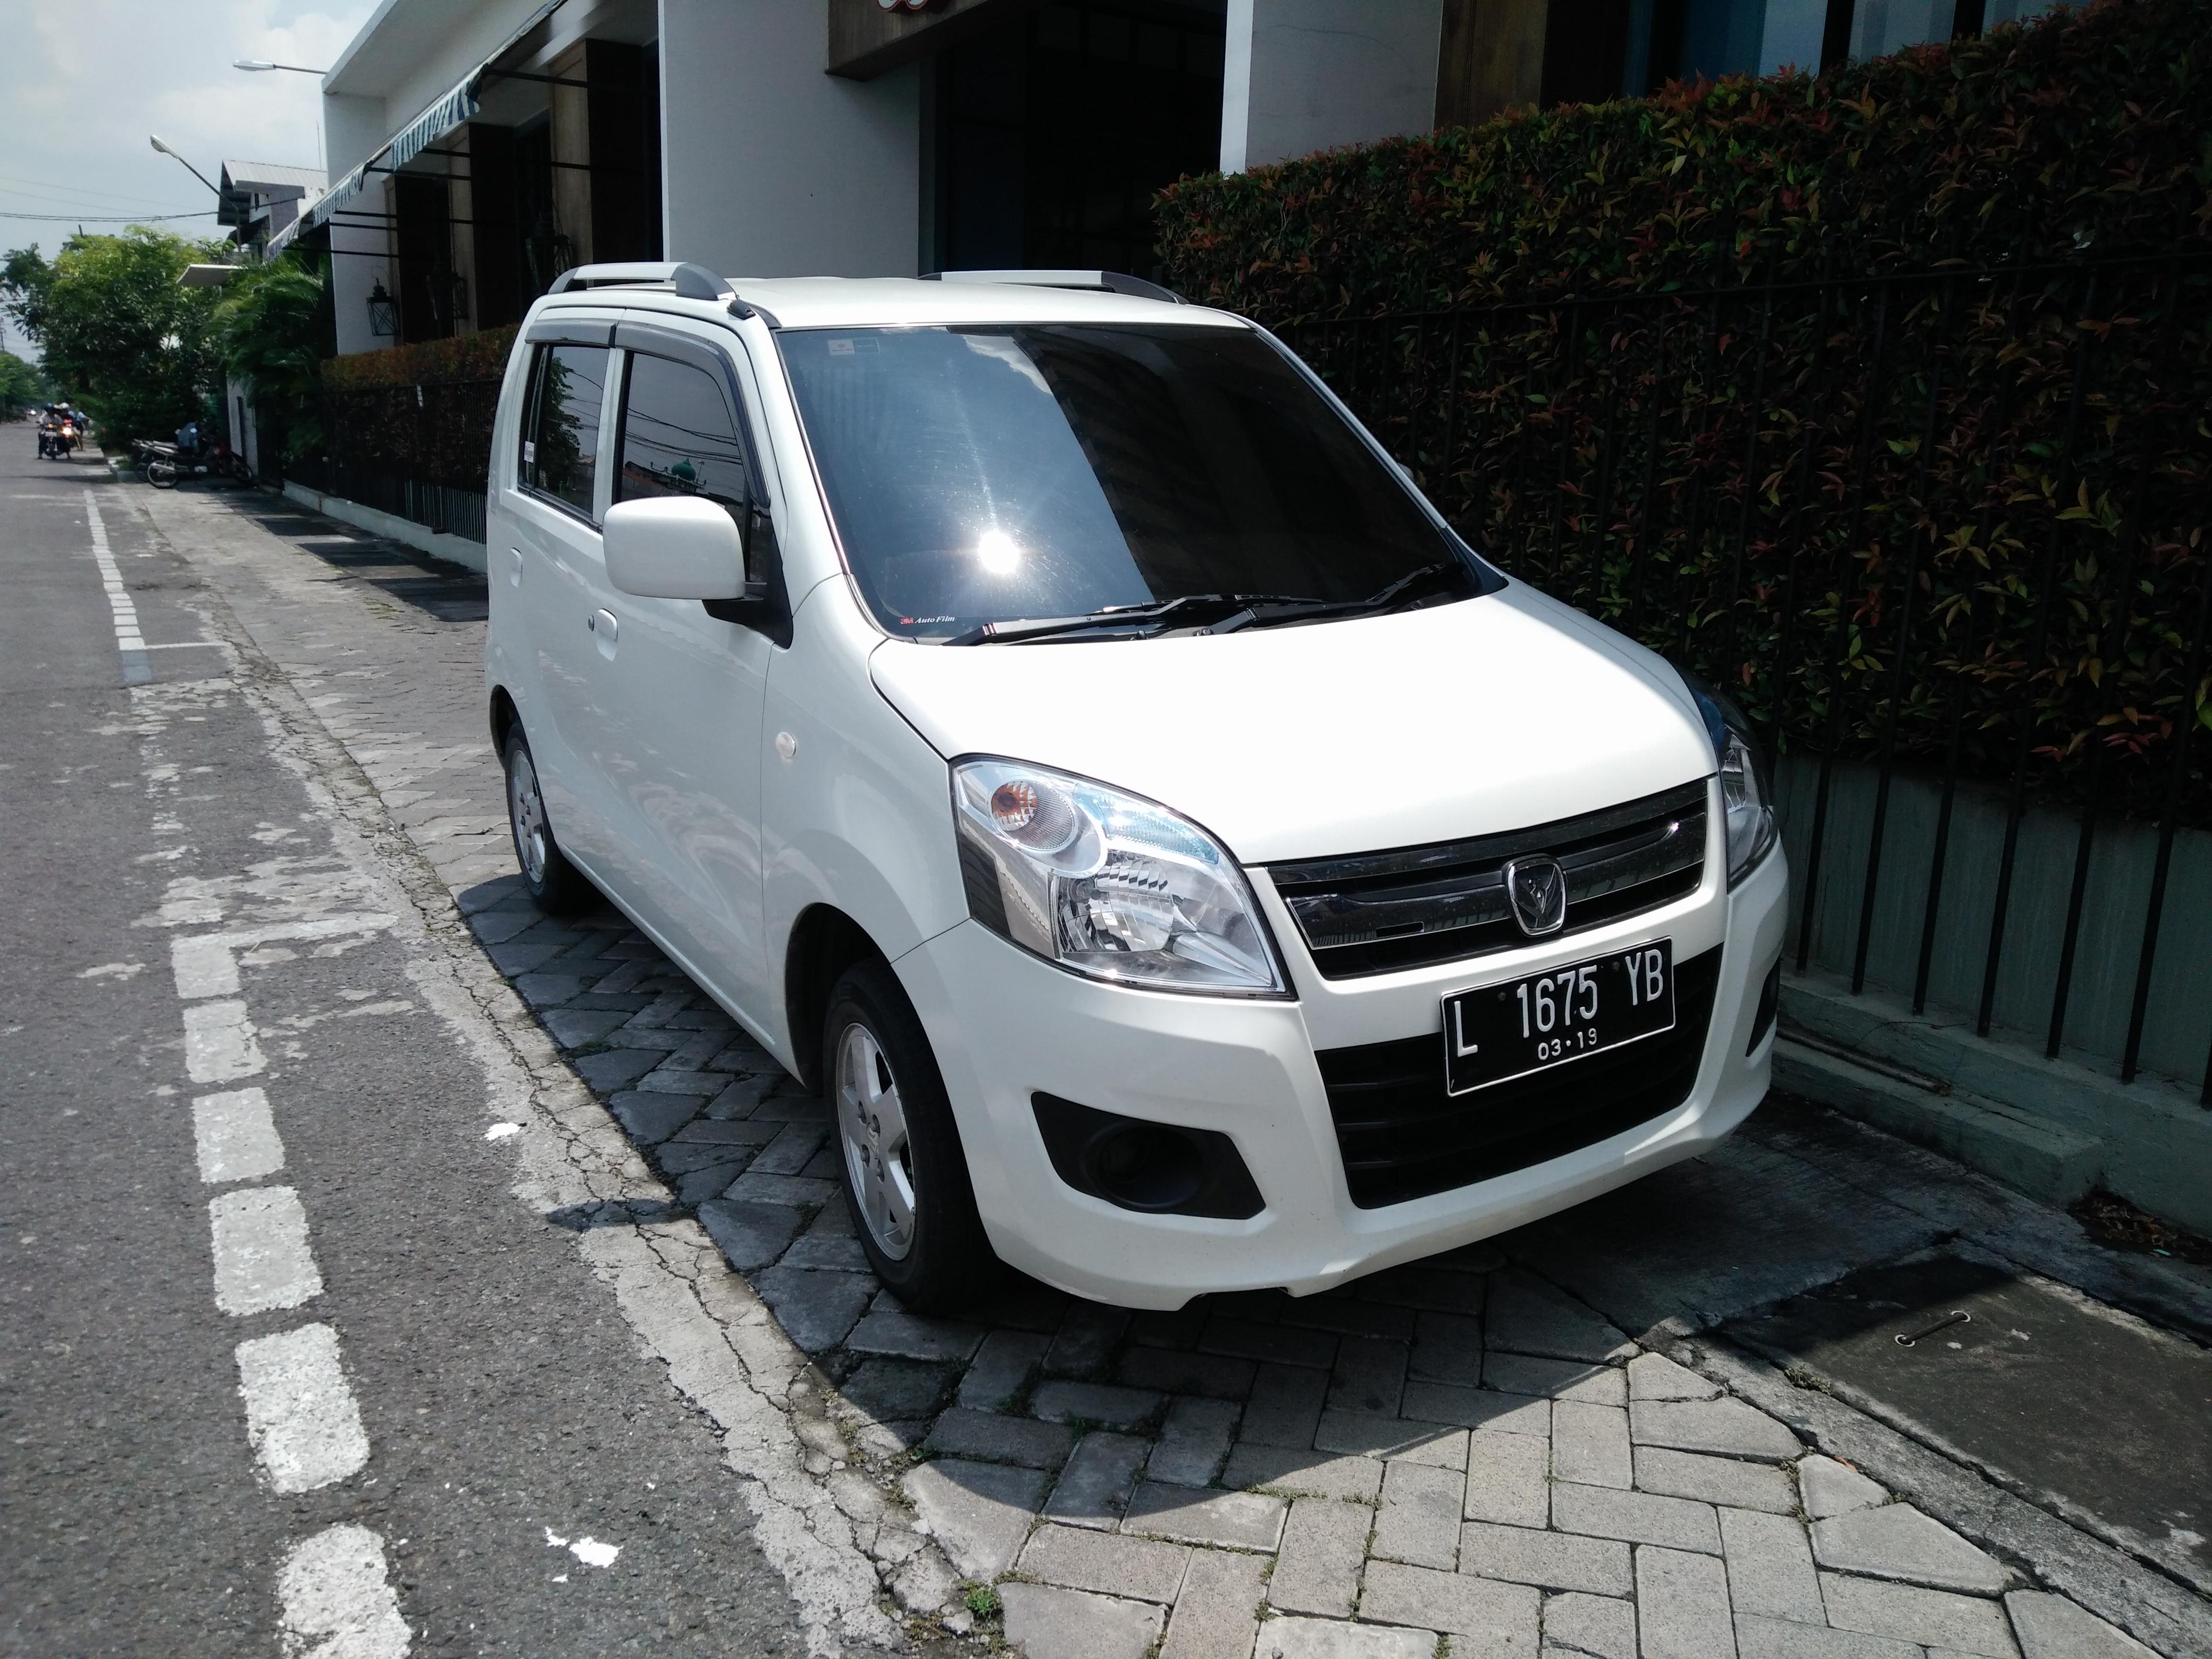 File:2014 Suzuki Karimun Wagon R GX (front), East Surabaya.jpg - Wikimedia Commons